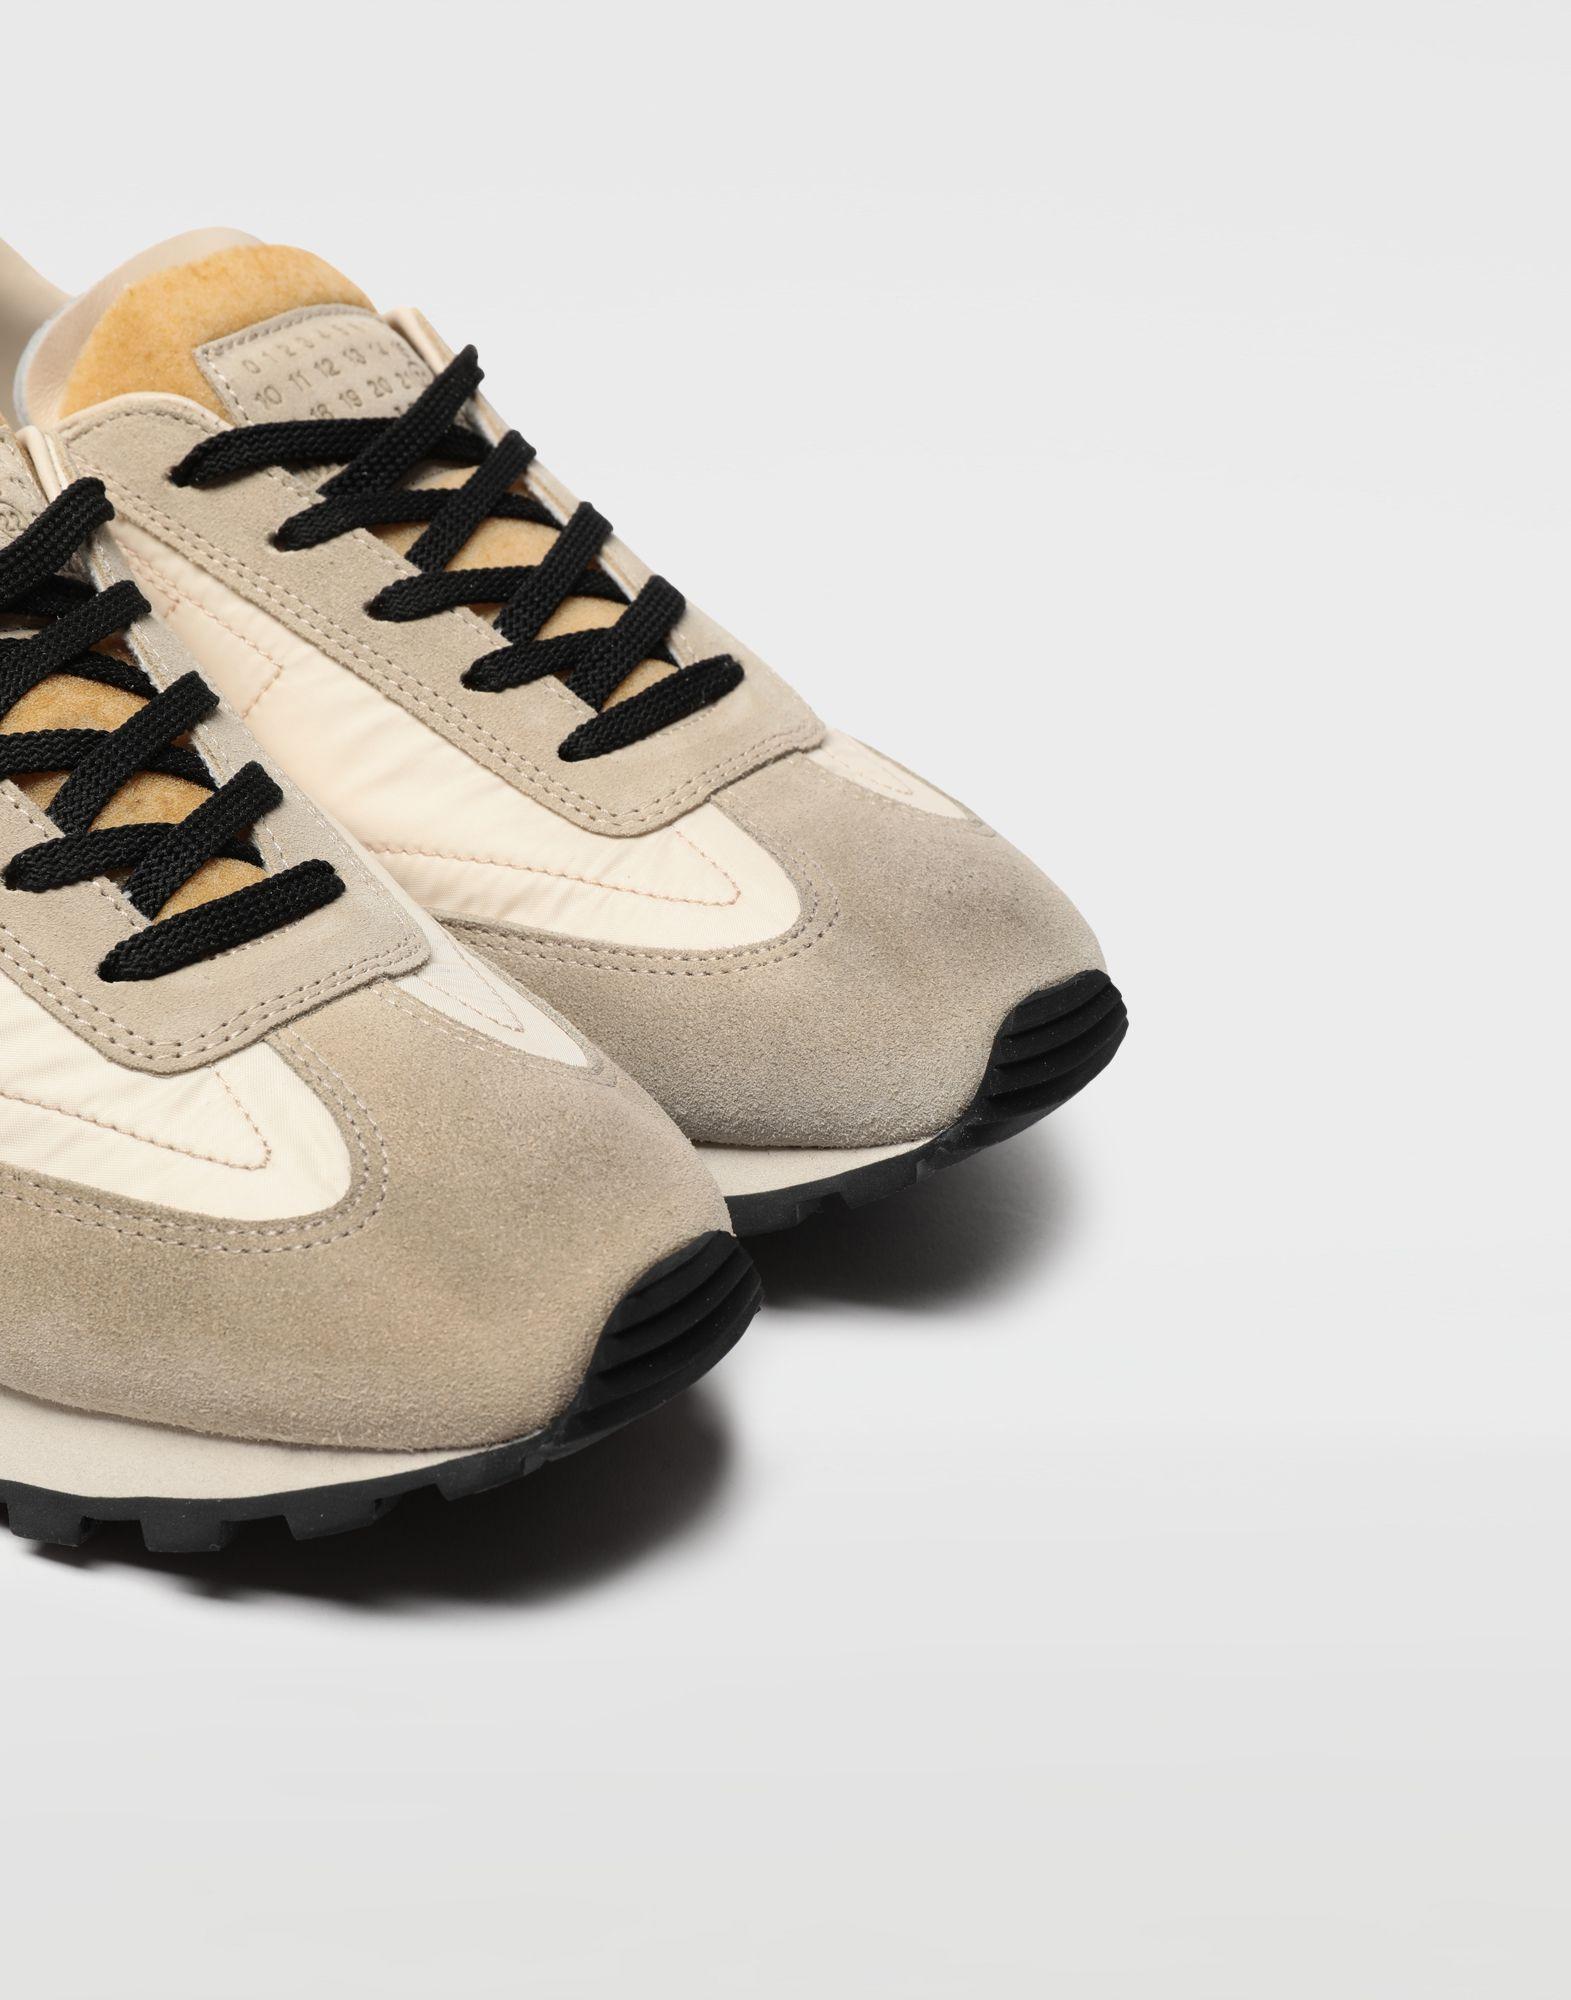 MAISON MARGIELA Low-Top-Sportschuhe in schmutziger Optik Sneakers Herren e